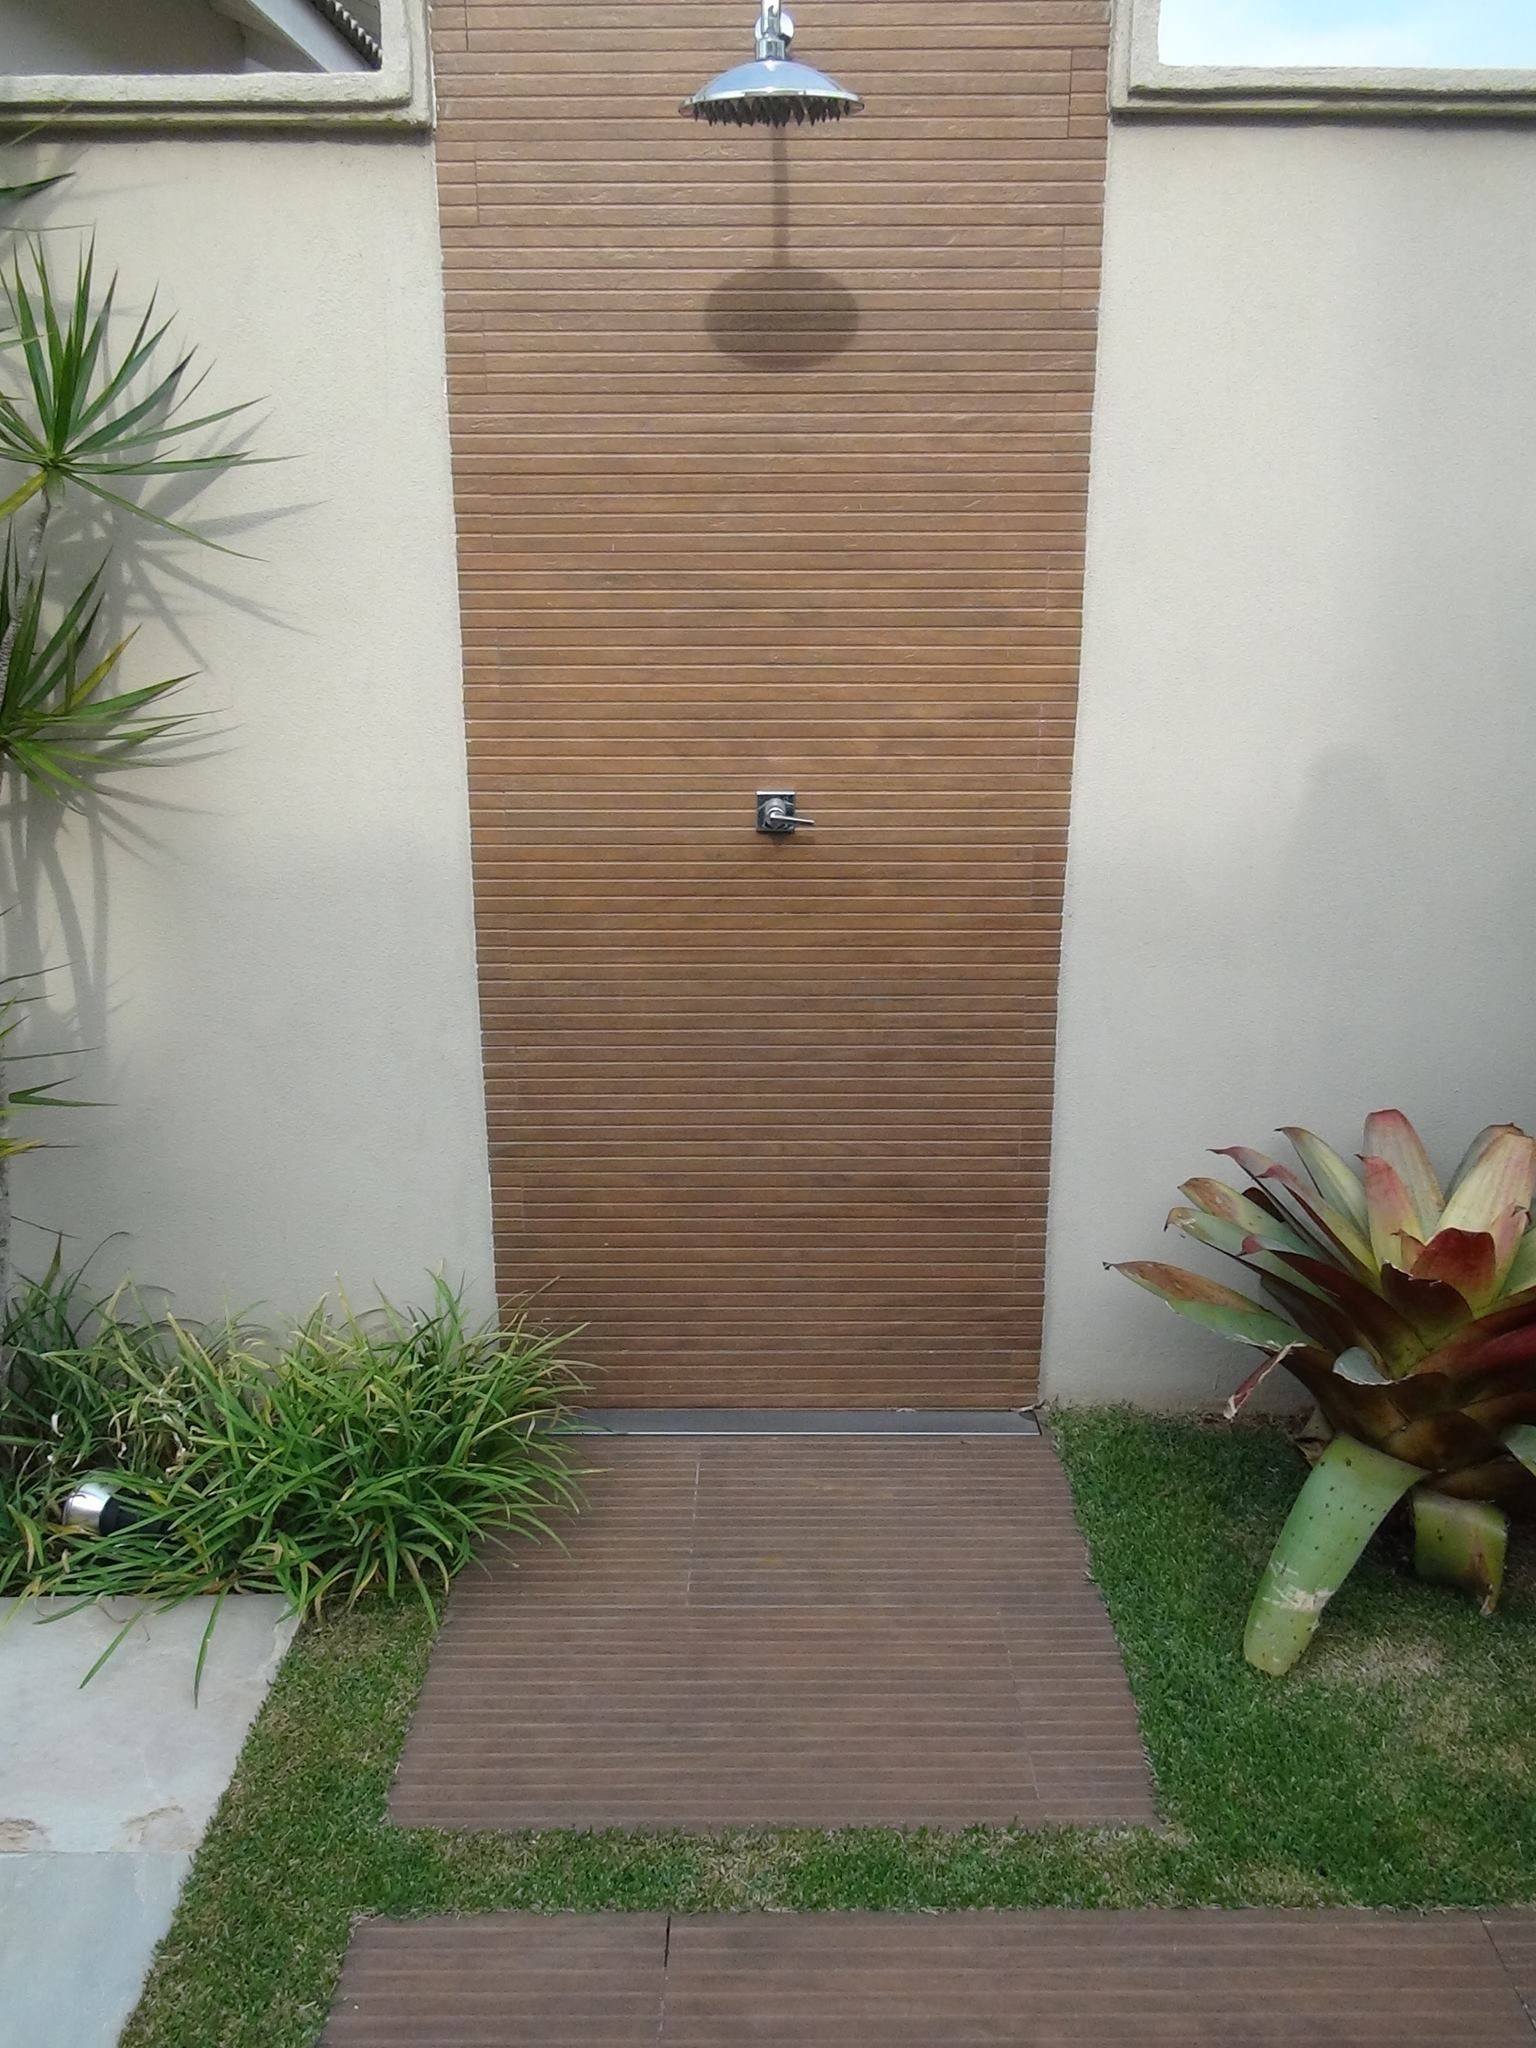 Duchas piscinas pinterest externos areas externas e - Duchas para jardin ...